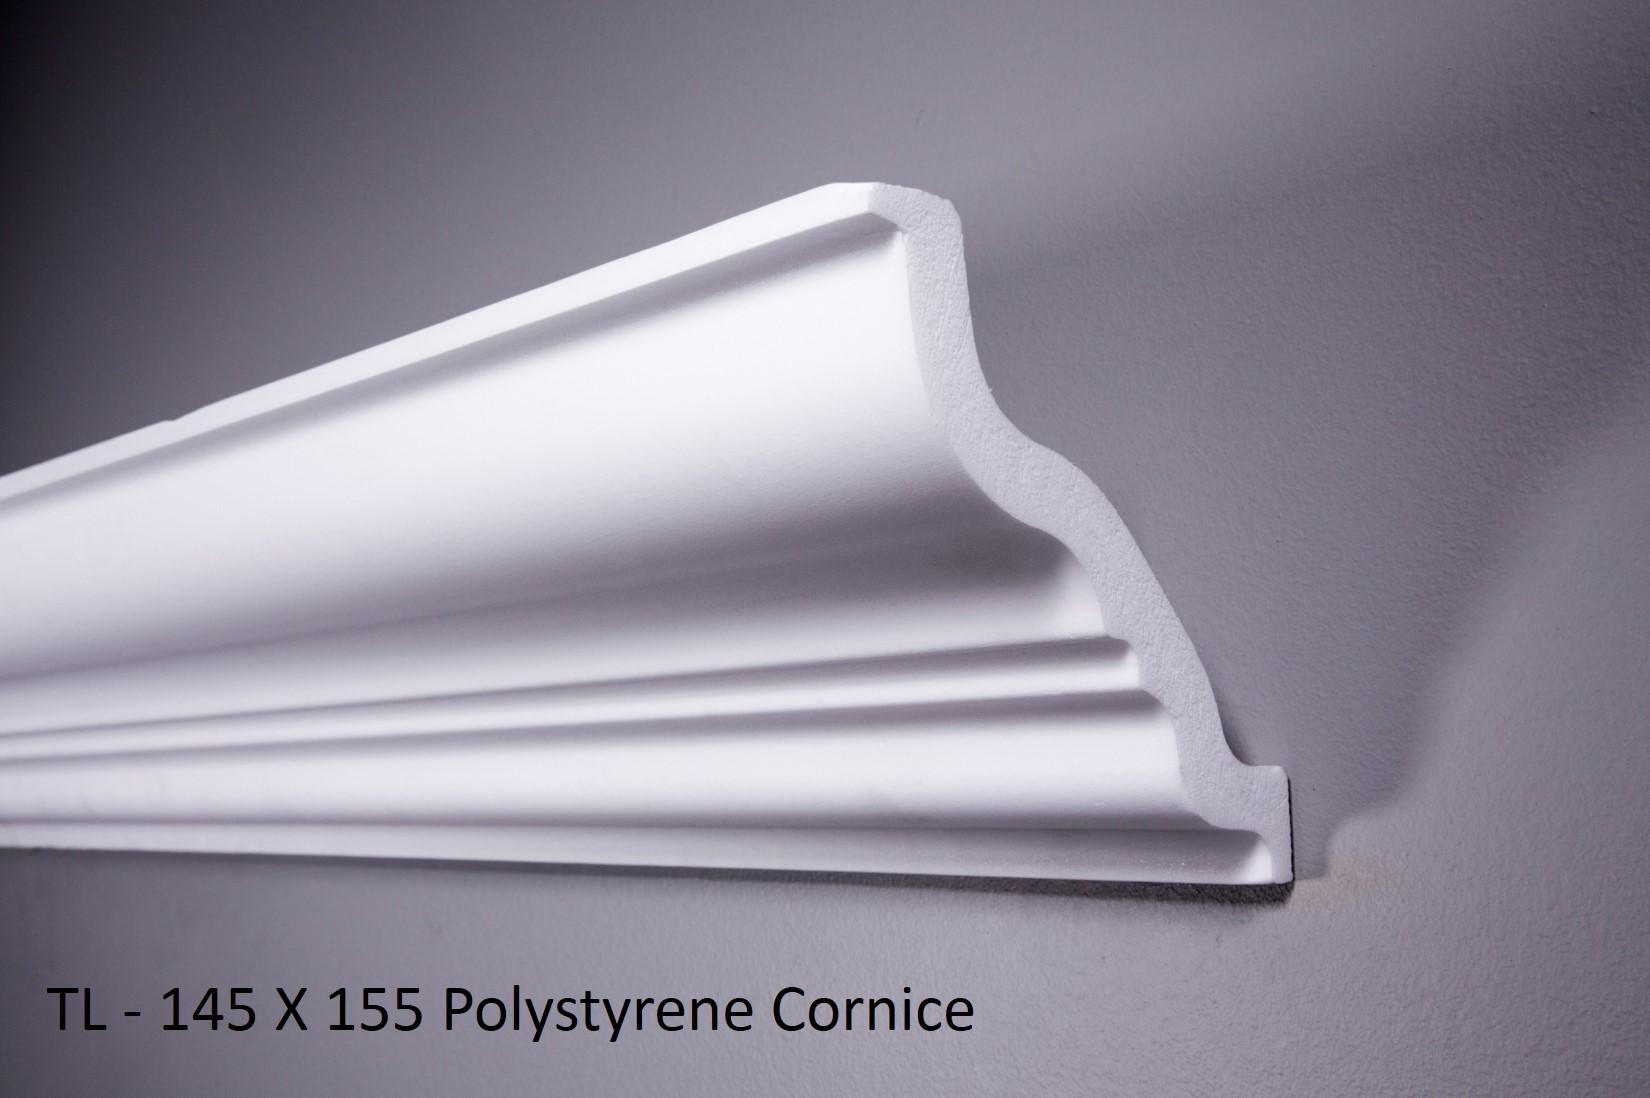 TL - 145 X 155 Polystyrene Cornice